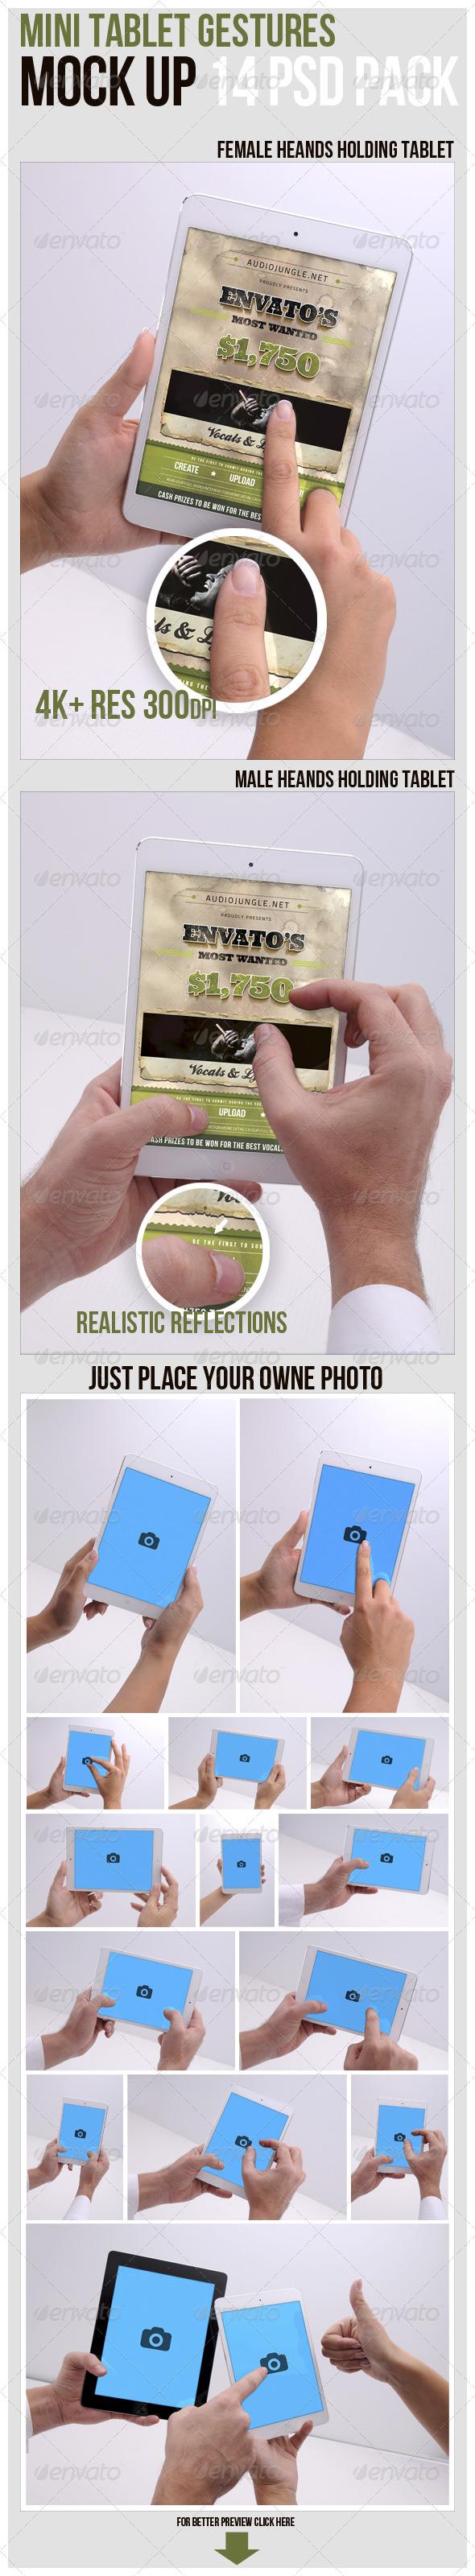 GraphicRiver Mini Tablet Gestures Mockup 6038017